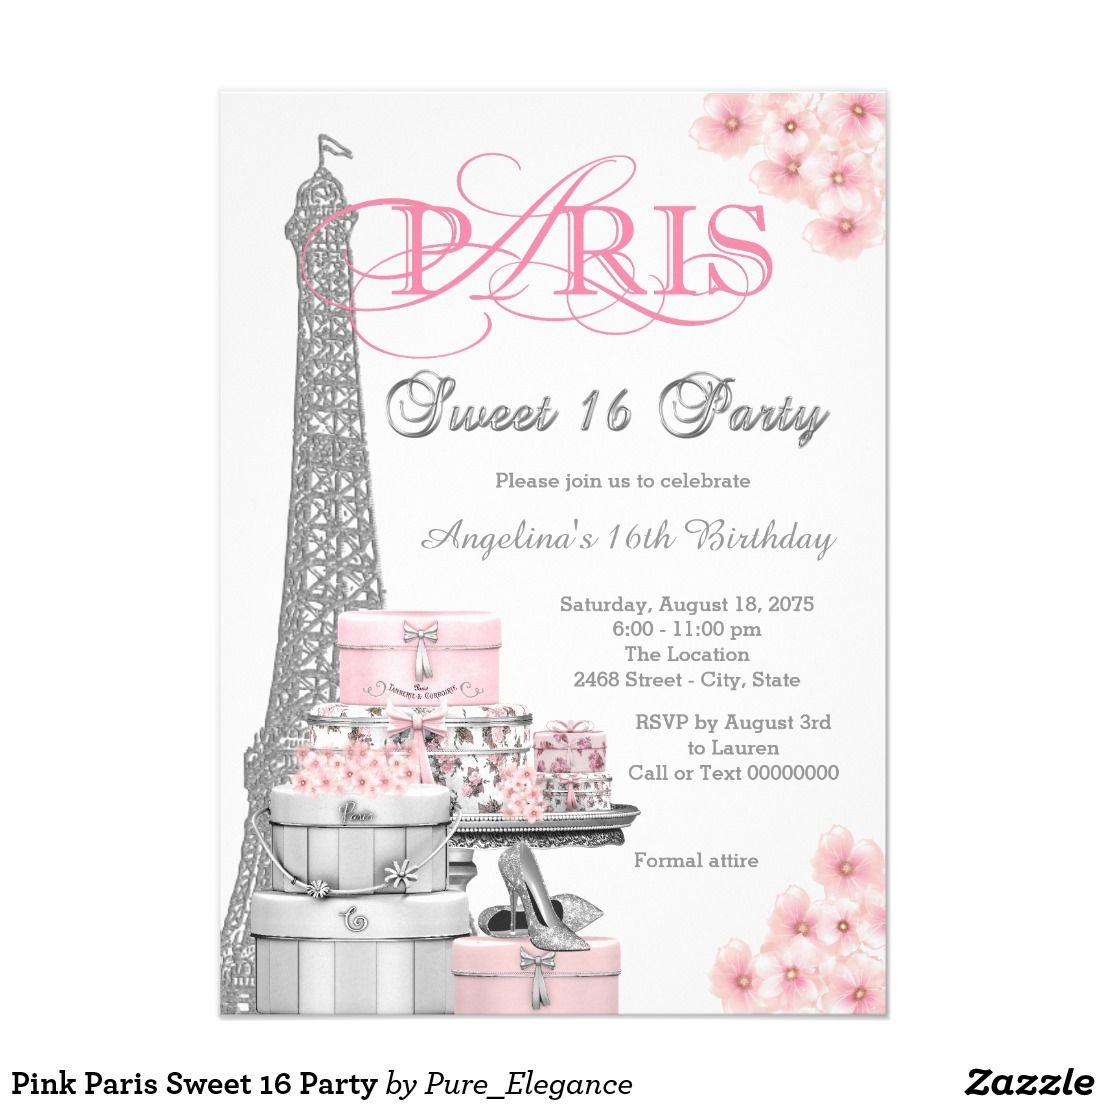 Pink Paris Sweet 16 Party Invitation | Birthday/Sweet Sixteen ...